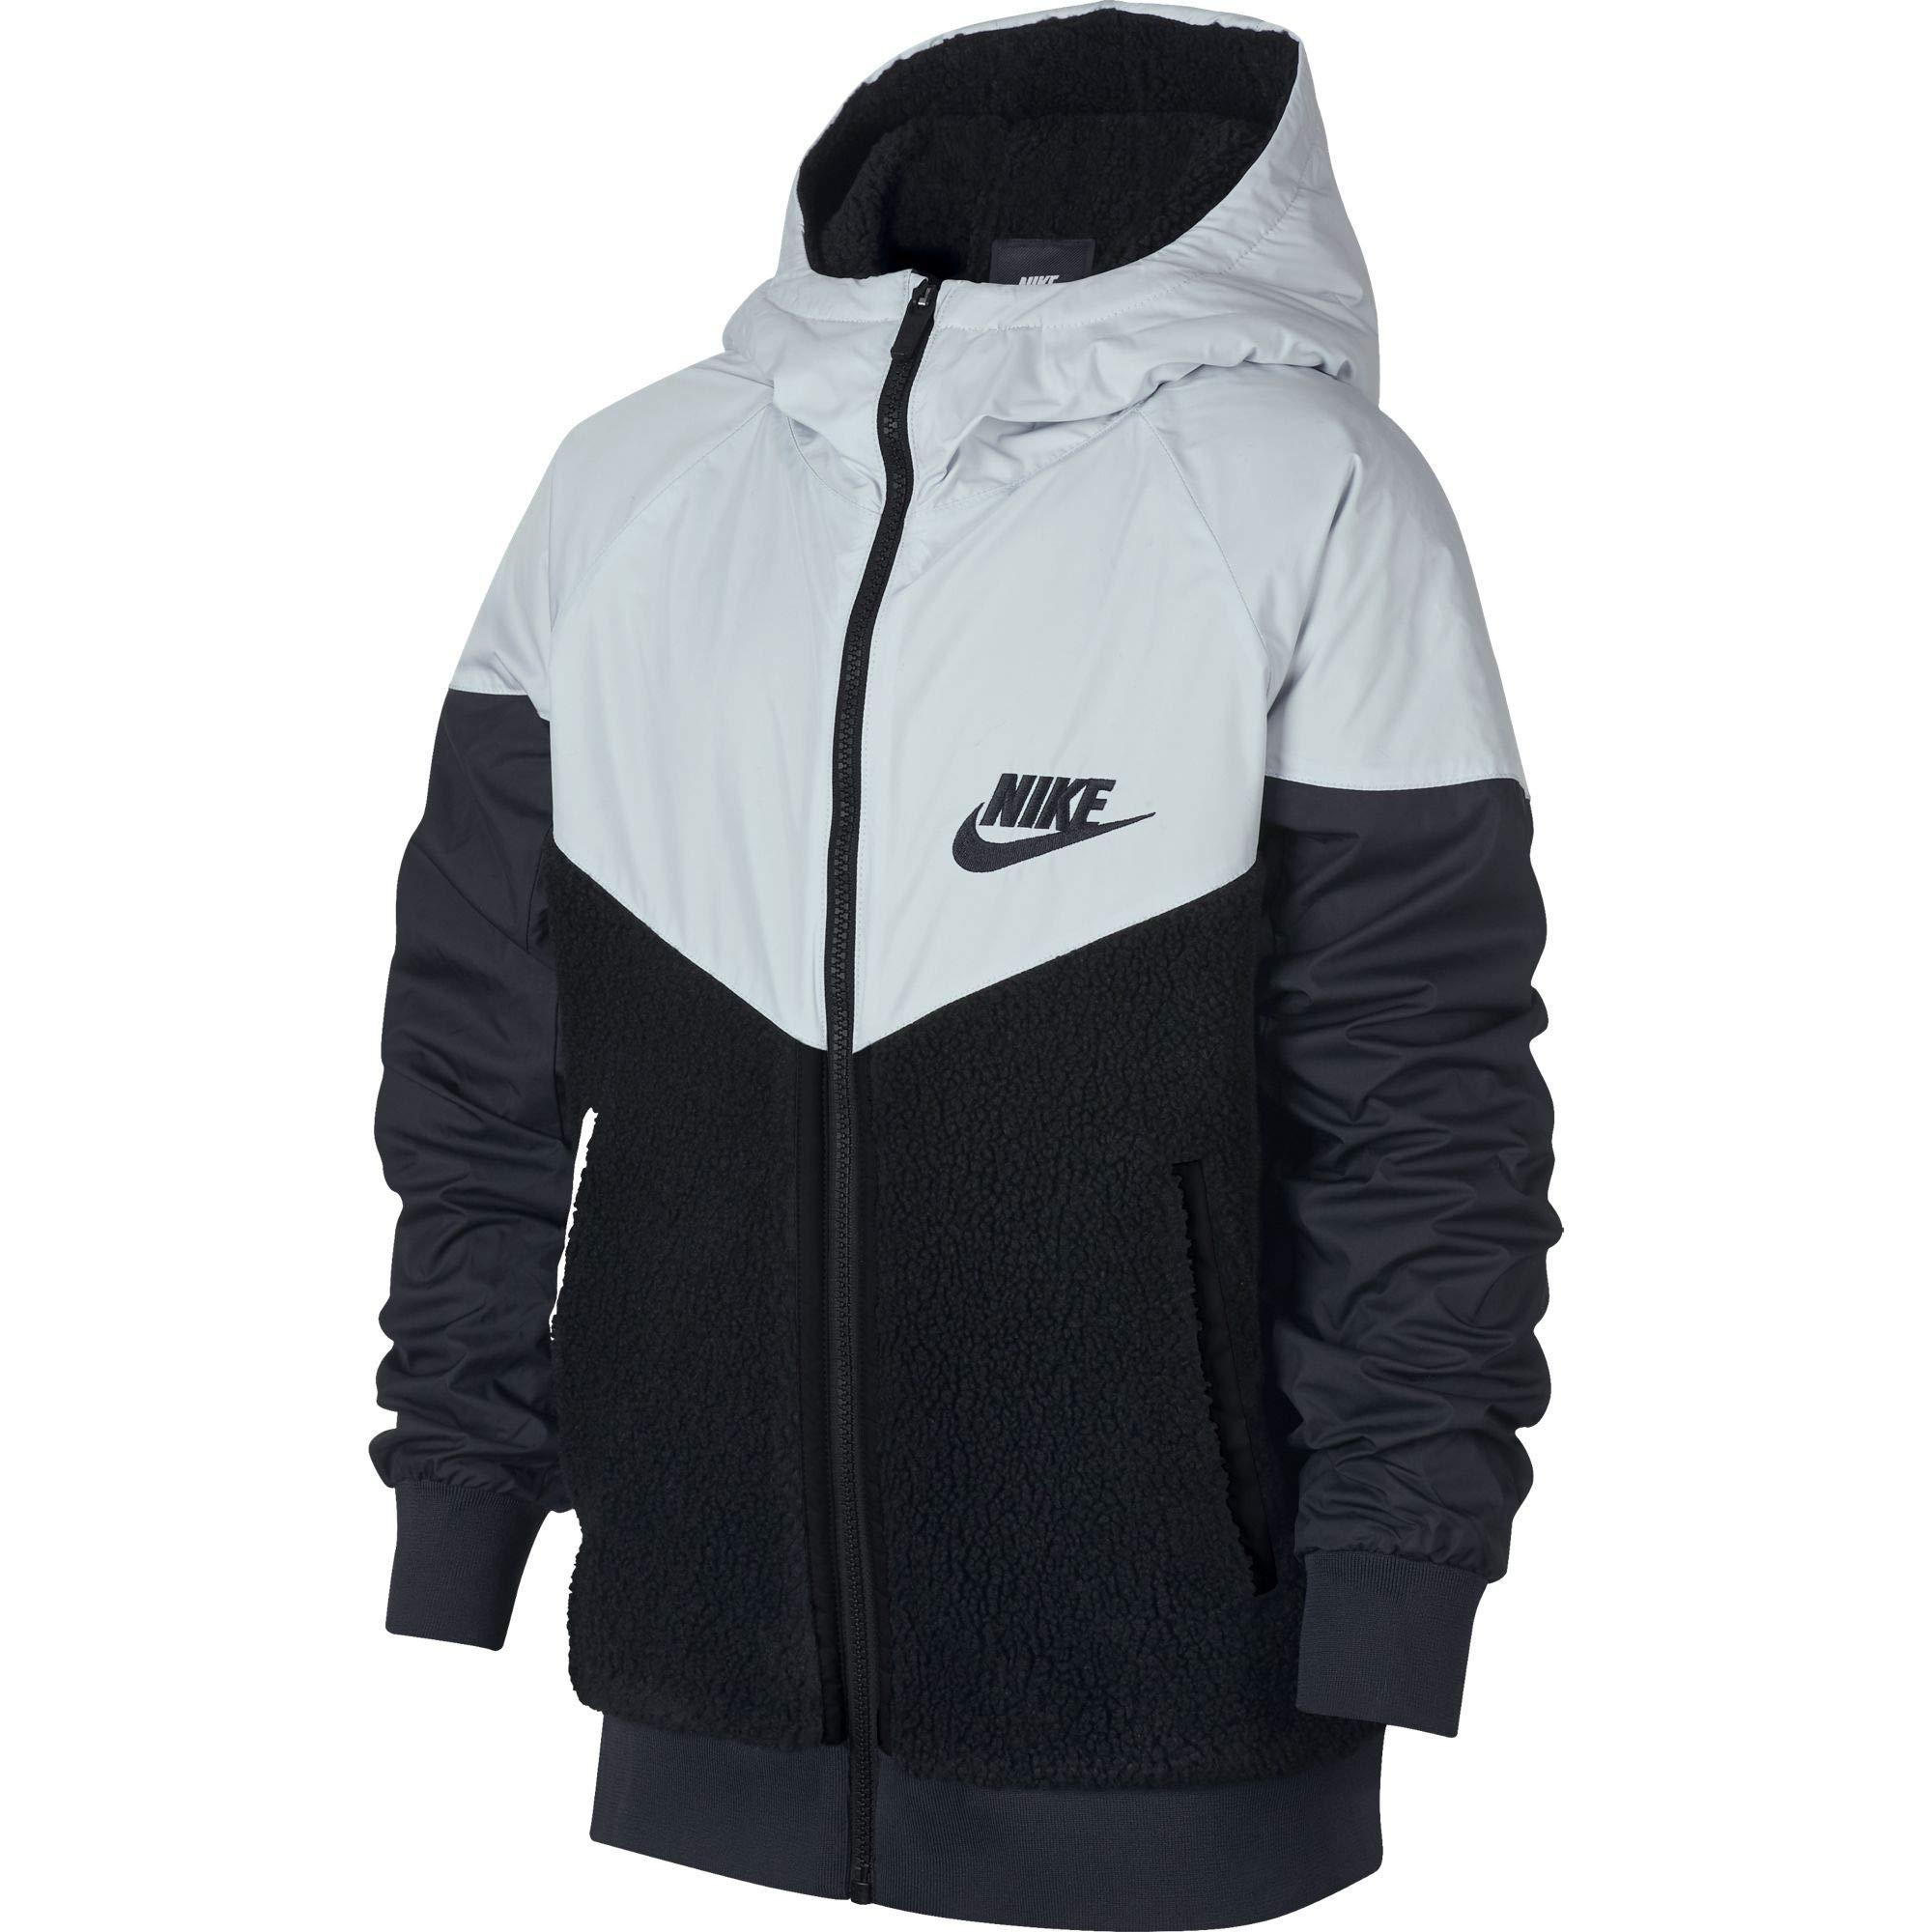 Nike Boy's Sportswear Windrunner Sherpa Jacket Black/Pure Platinum/Black Size Small